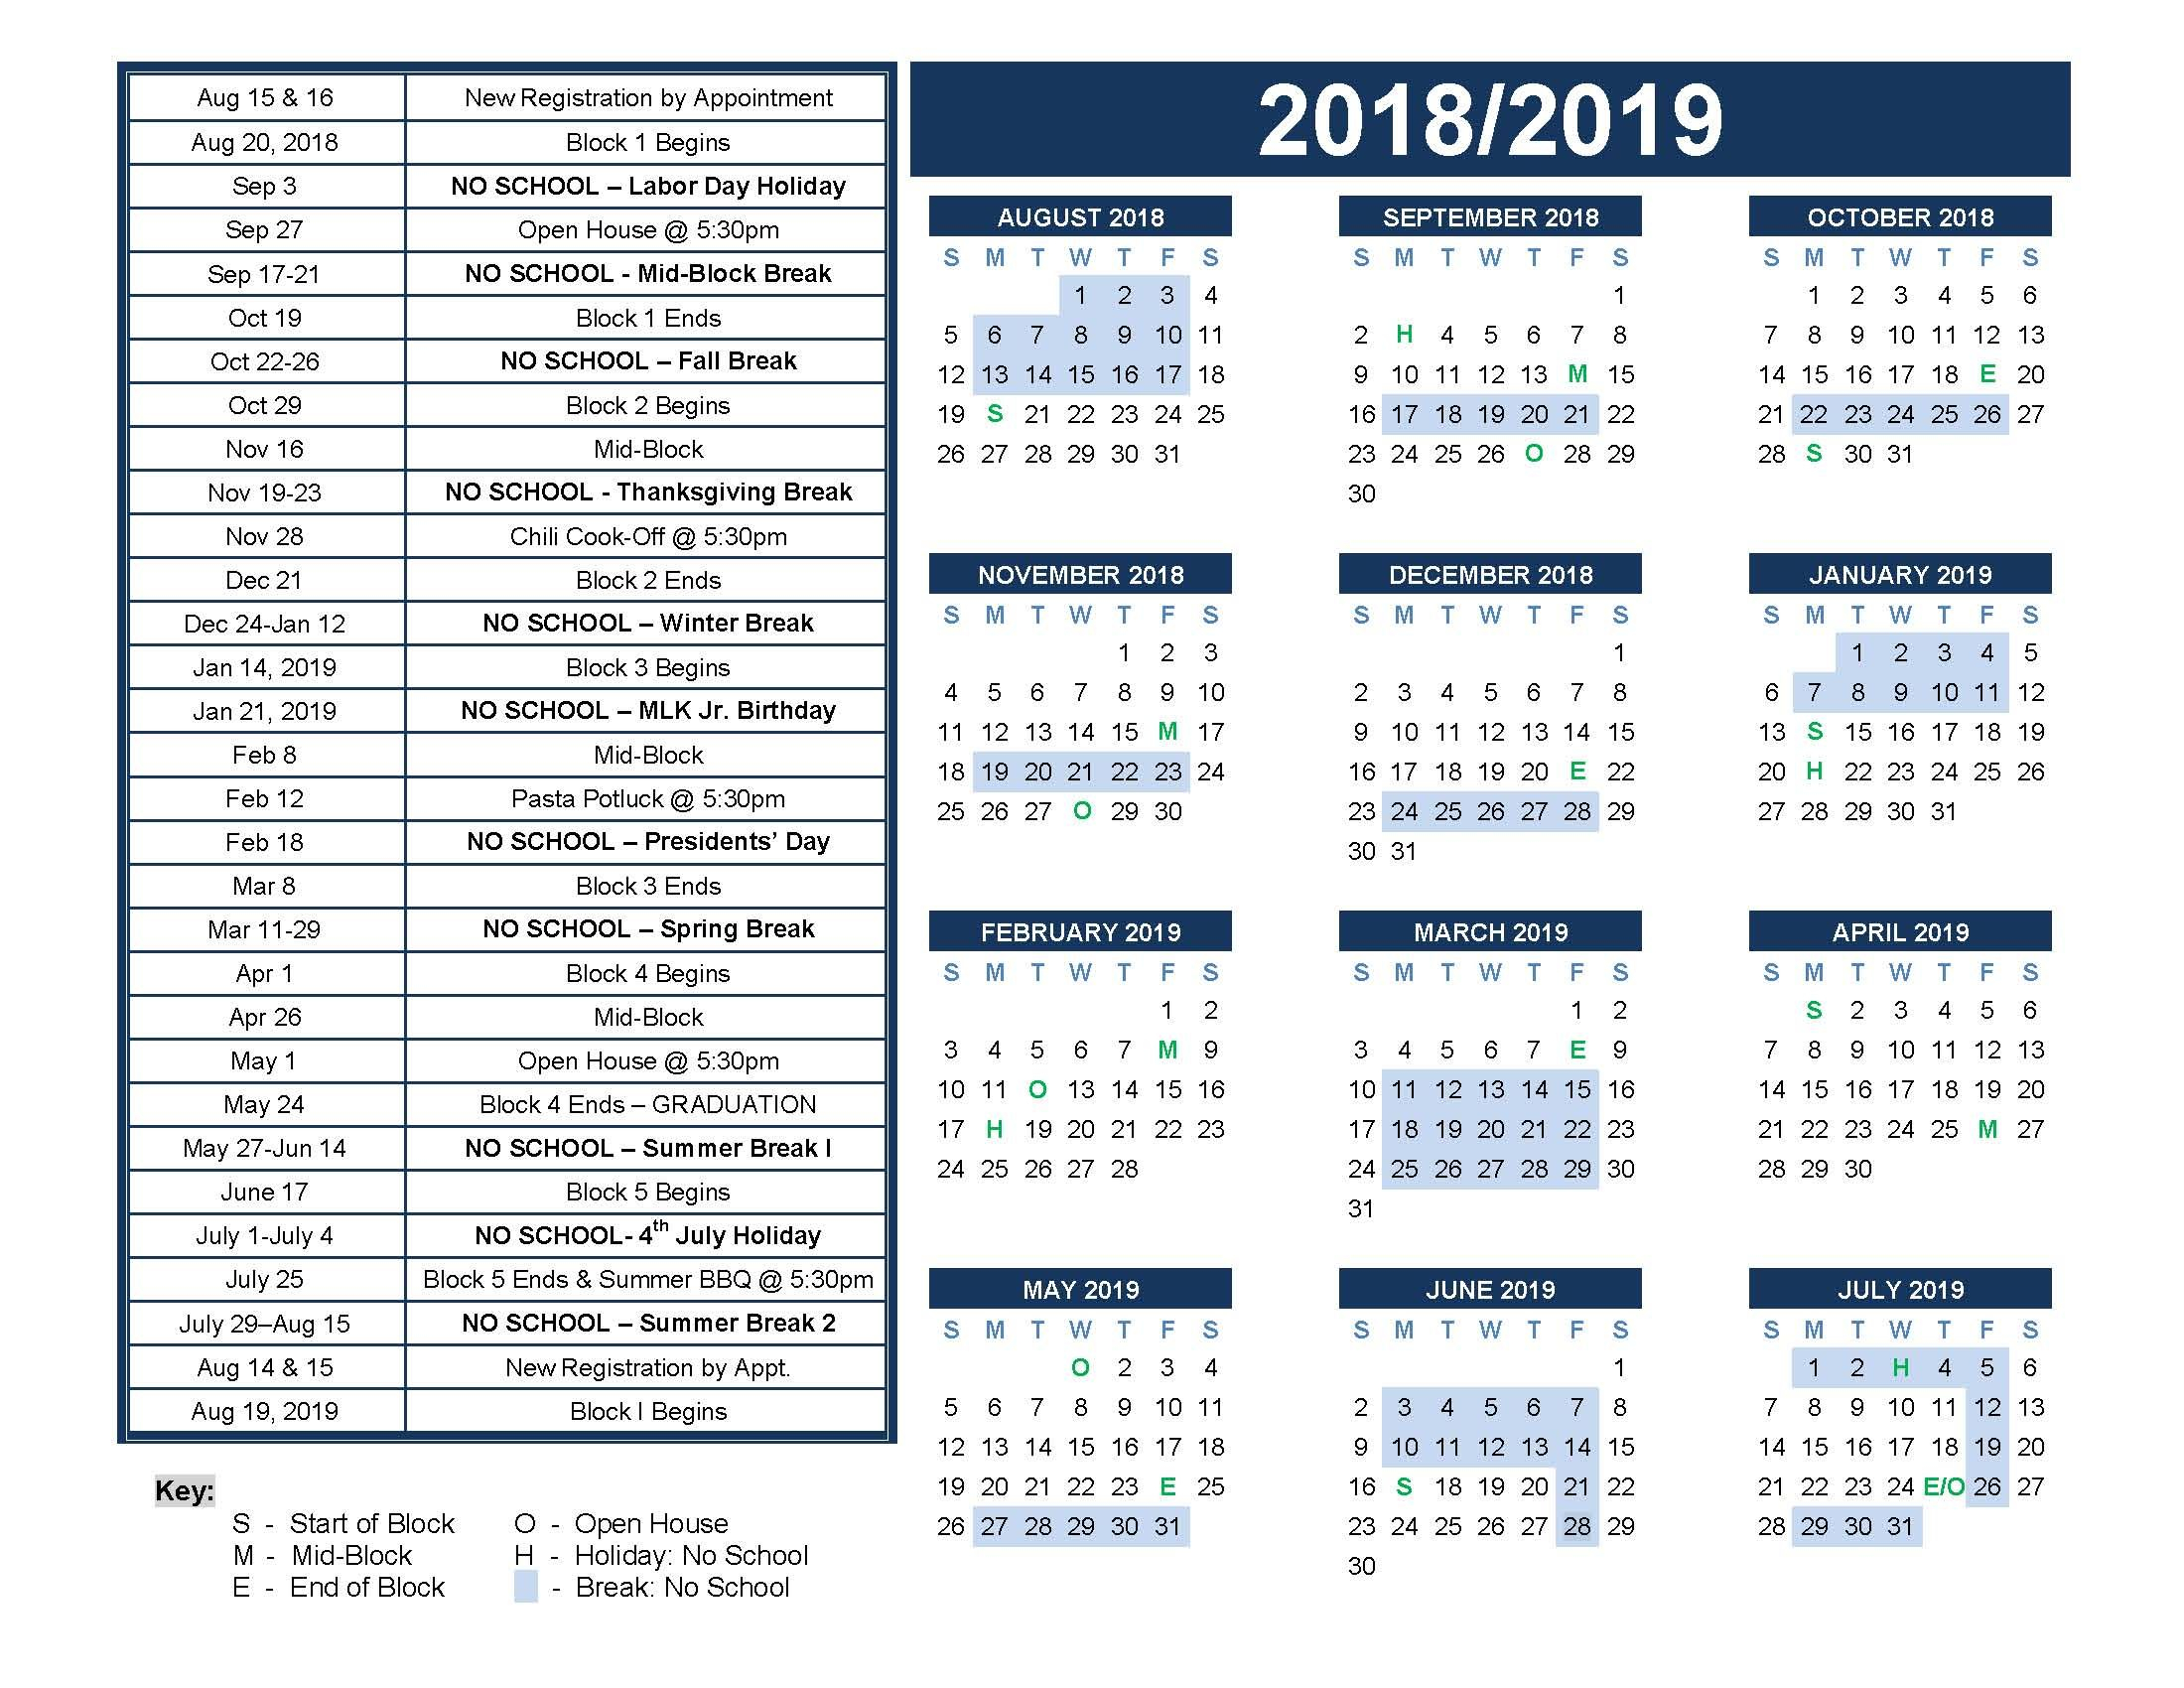 ✅Cu Boulder Academic Calendar | Academic Calendar, Dry In University Of Melbourne Academic Calendar